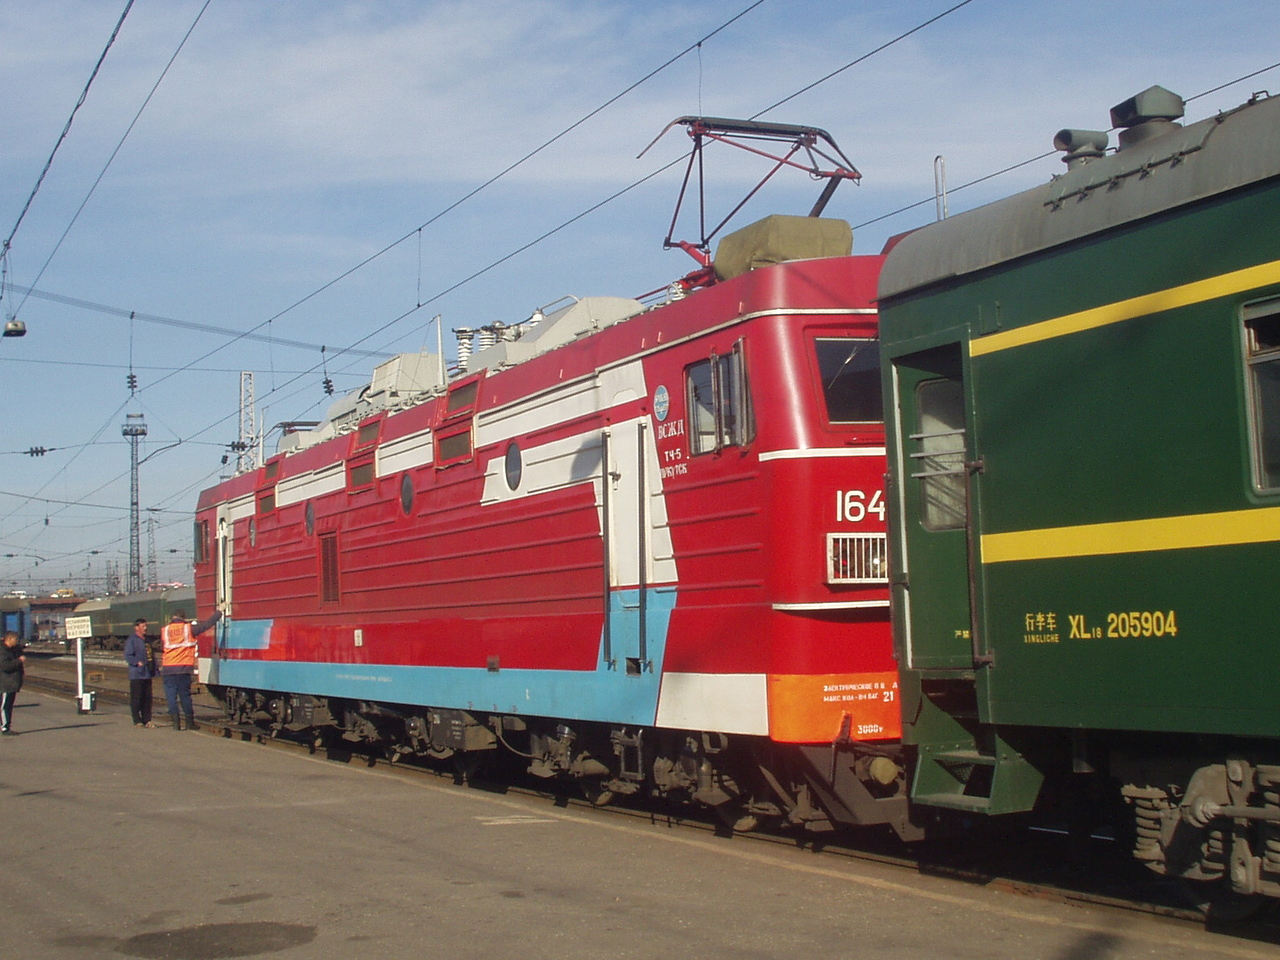 train04.jpg